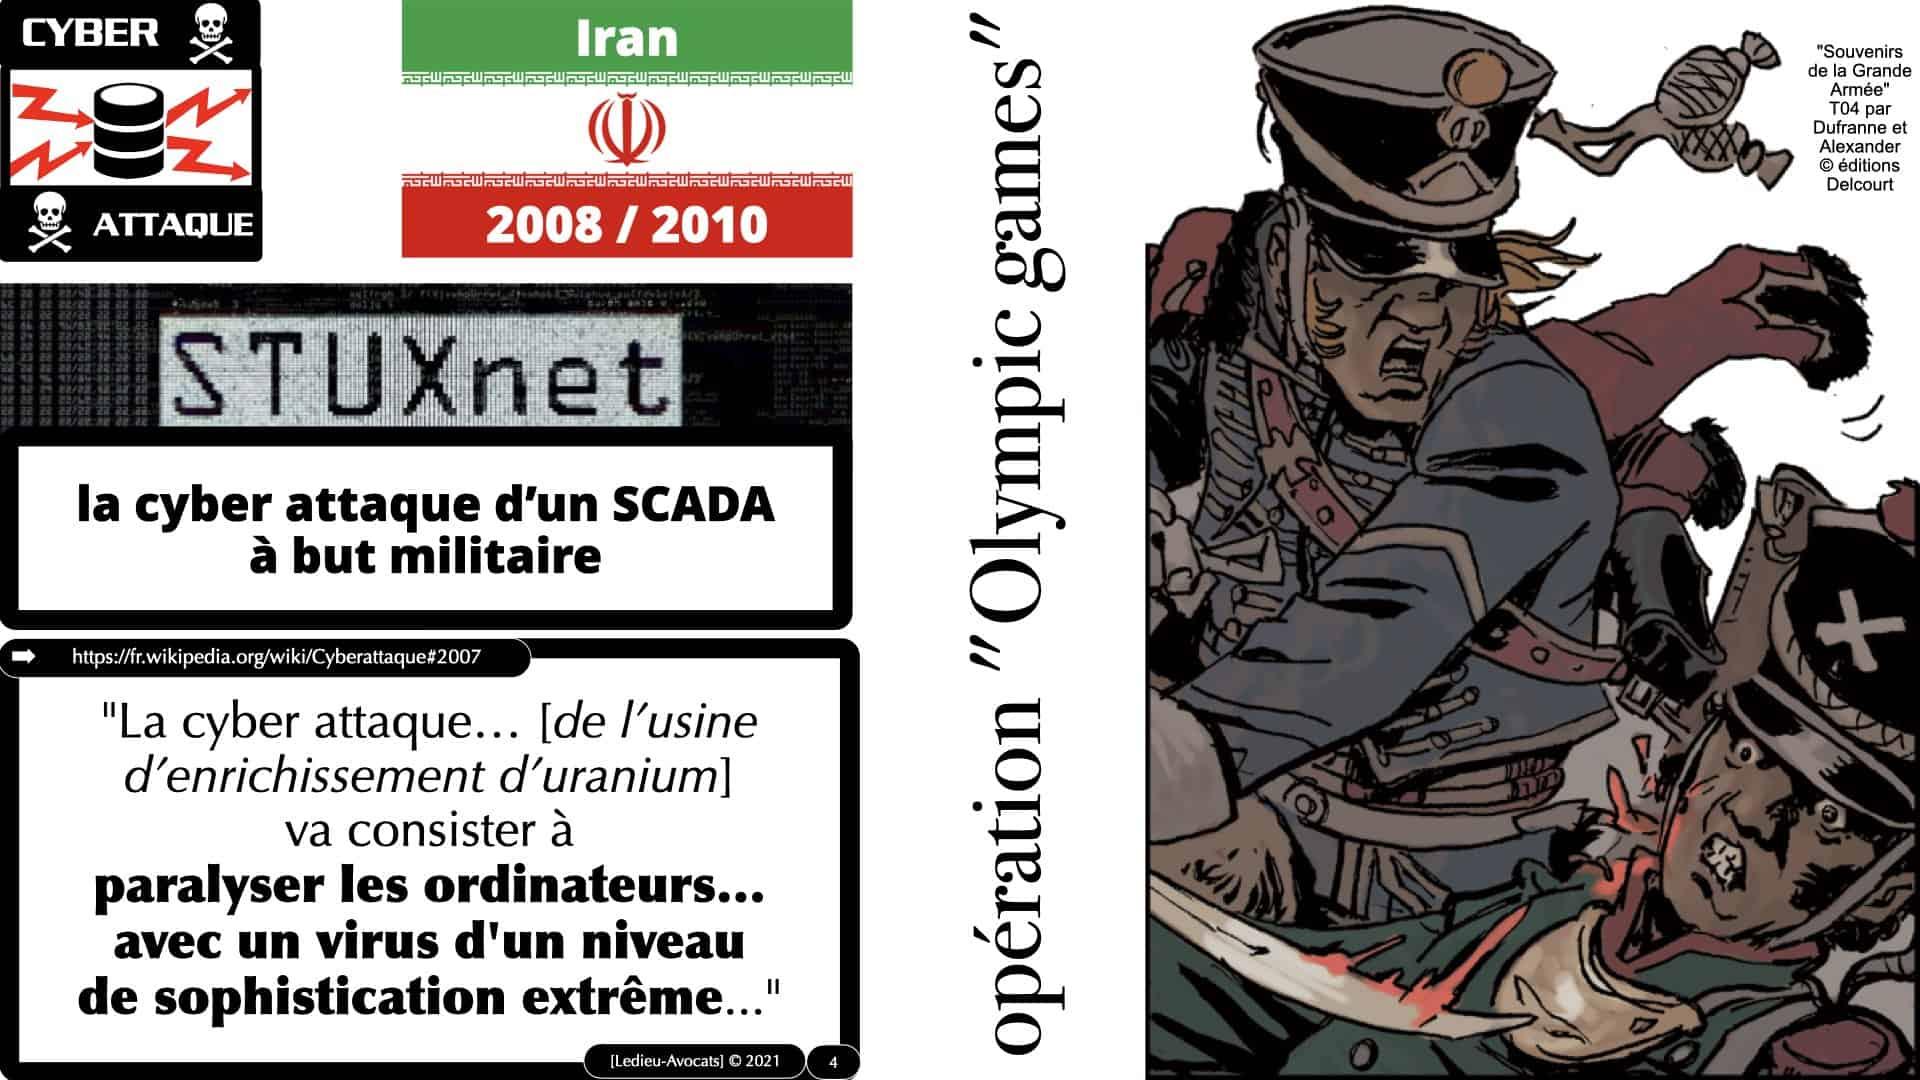 302 CYBER ATTAQUE système industriel © Ledieu-Avocats.004